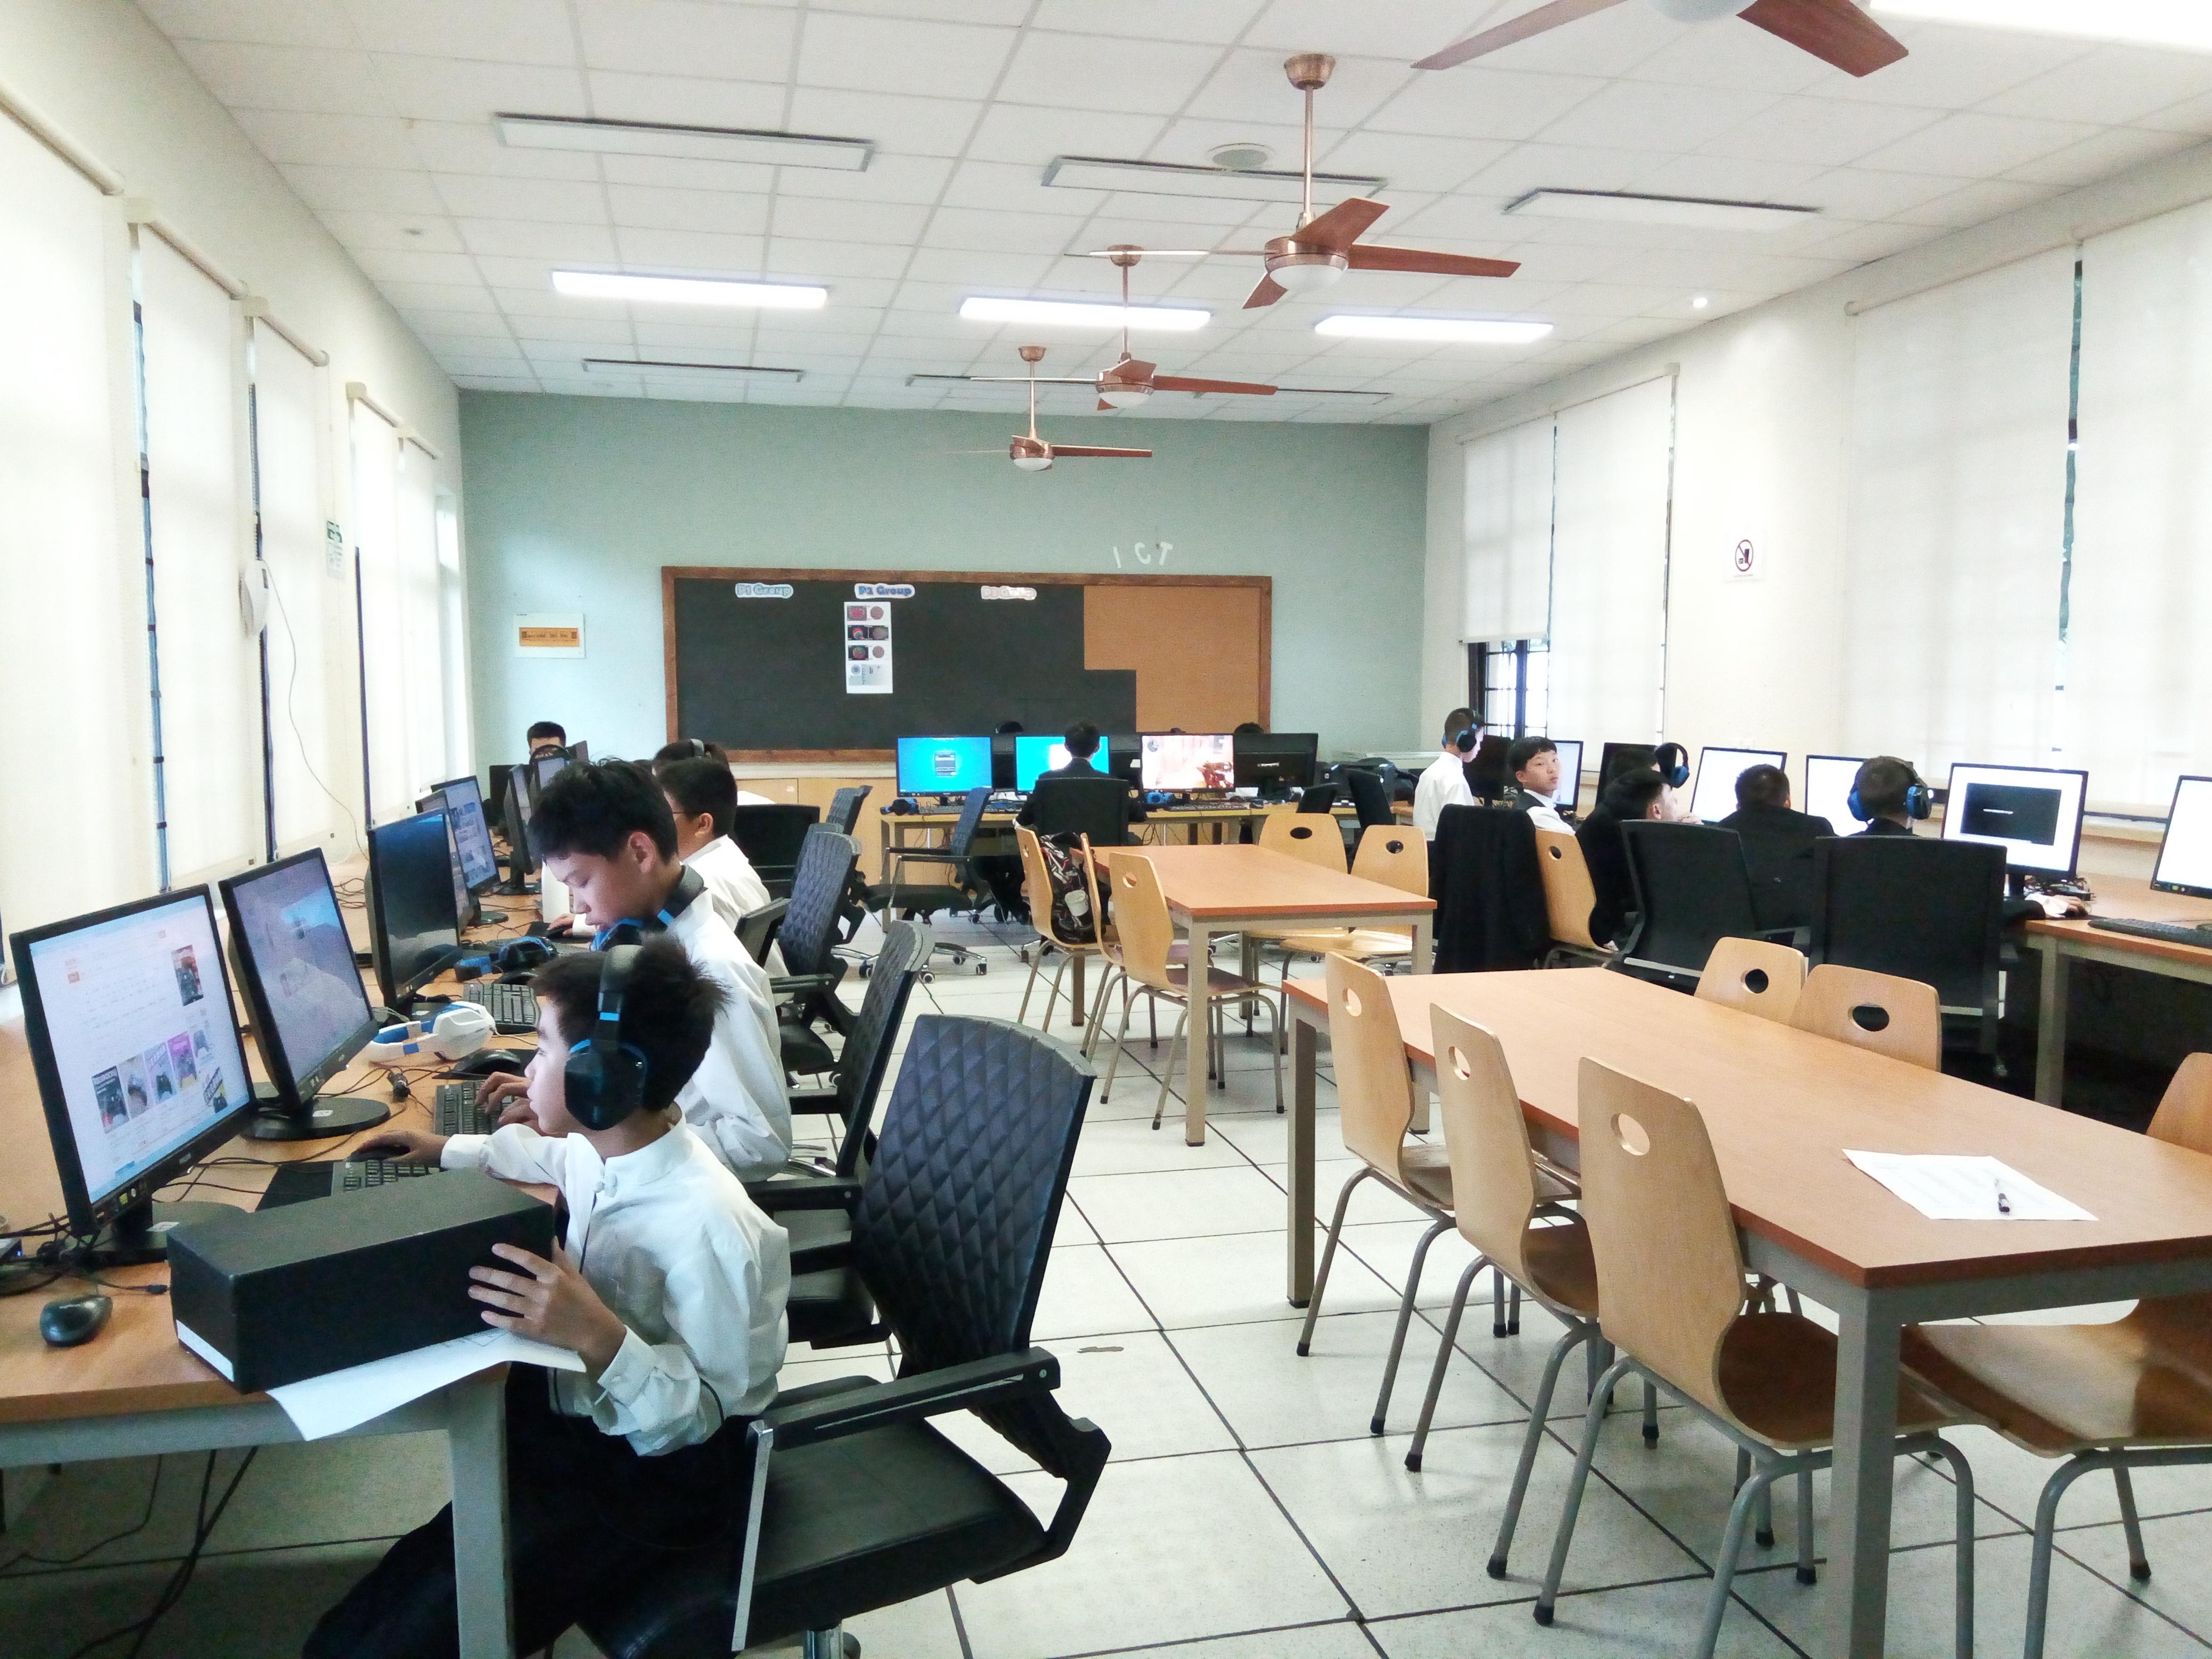 Confucius-International-School-in-China2.jpg